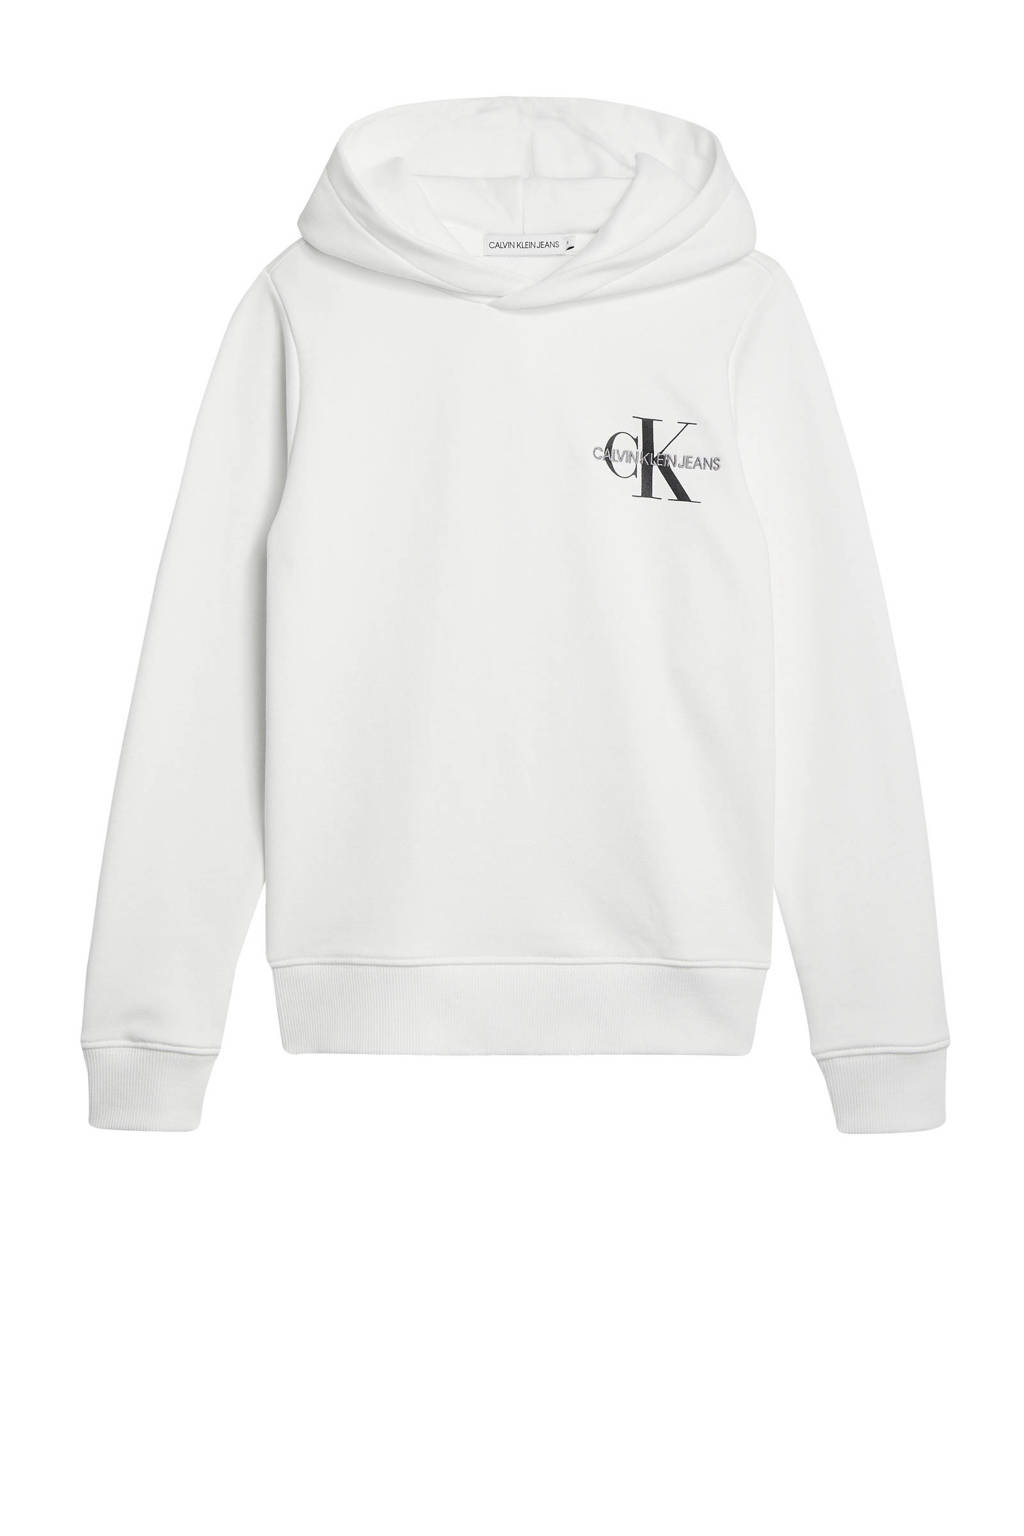 CALVIN KLEIN JEANS hoodie met logo wit/zwart, Wit/zwart